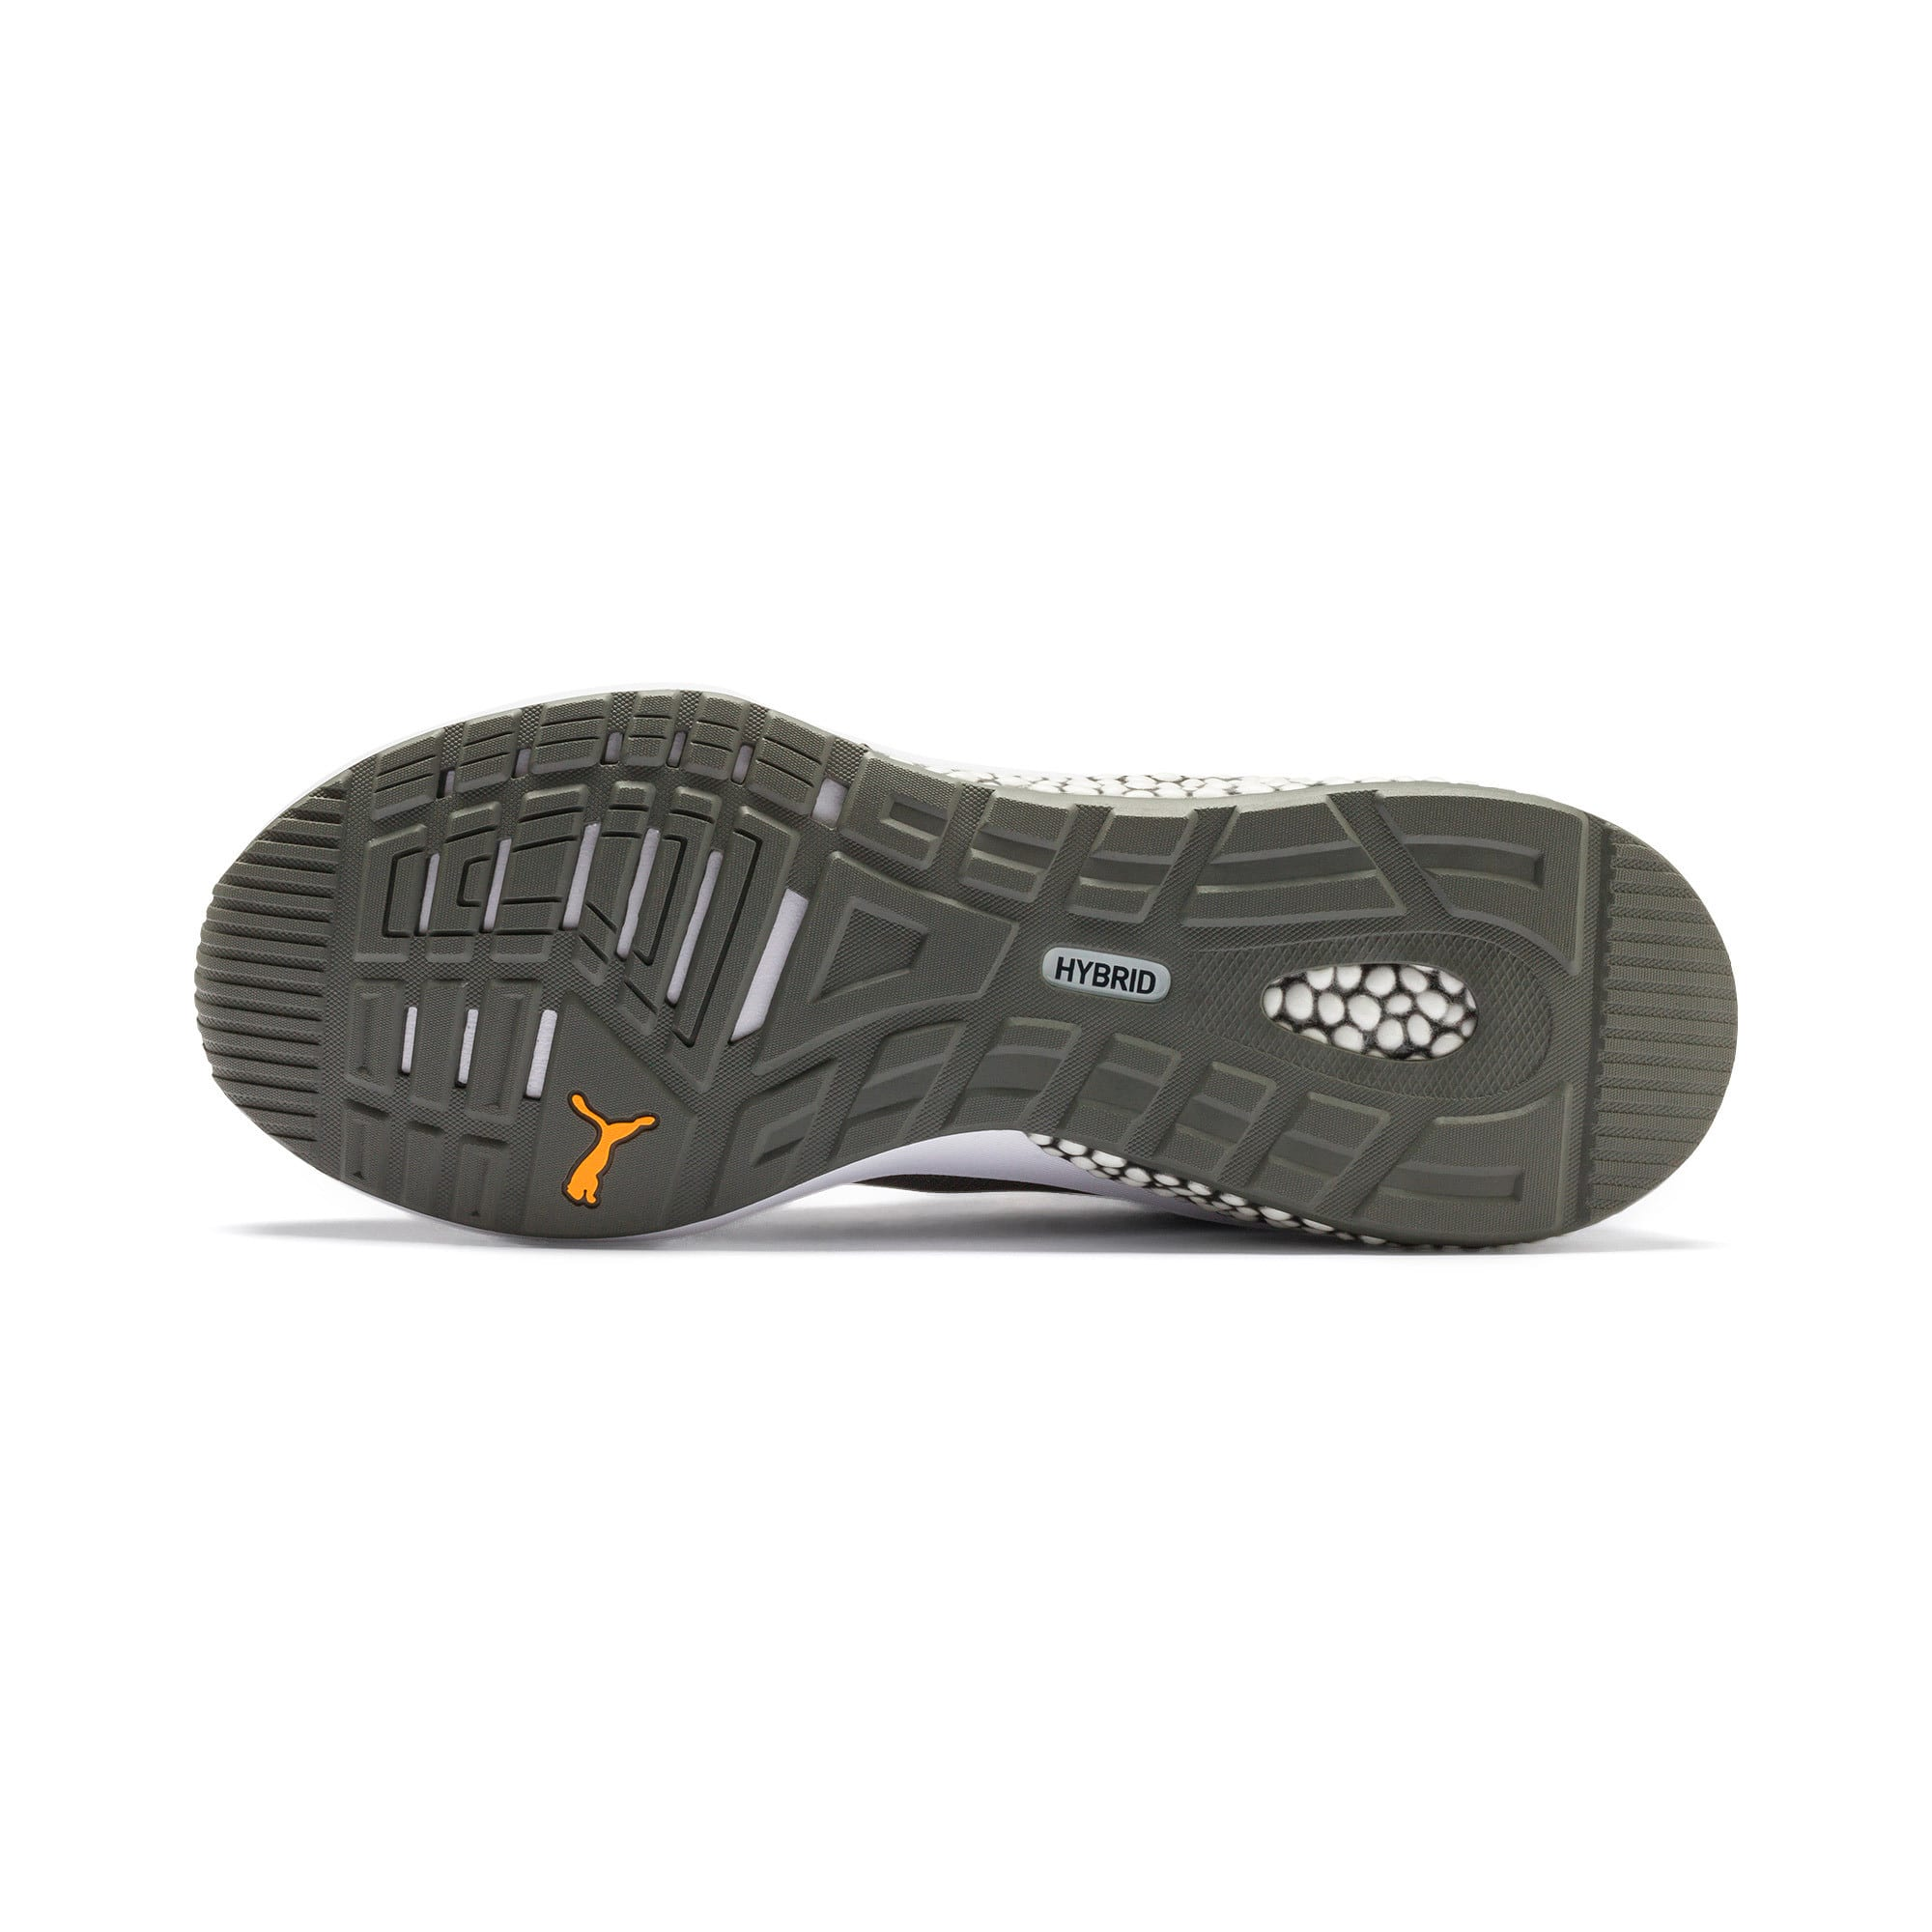 Thumbnail 4 of HYBRID NX Rave Men's Running Shoes, CASTLEROCK-Purple-Orange, medium